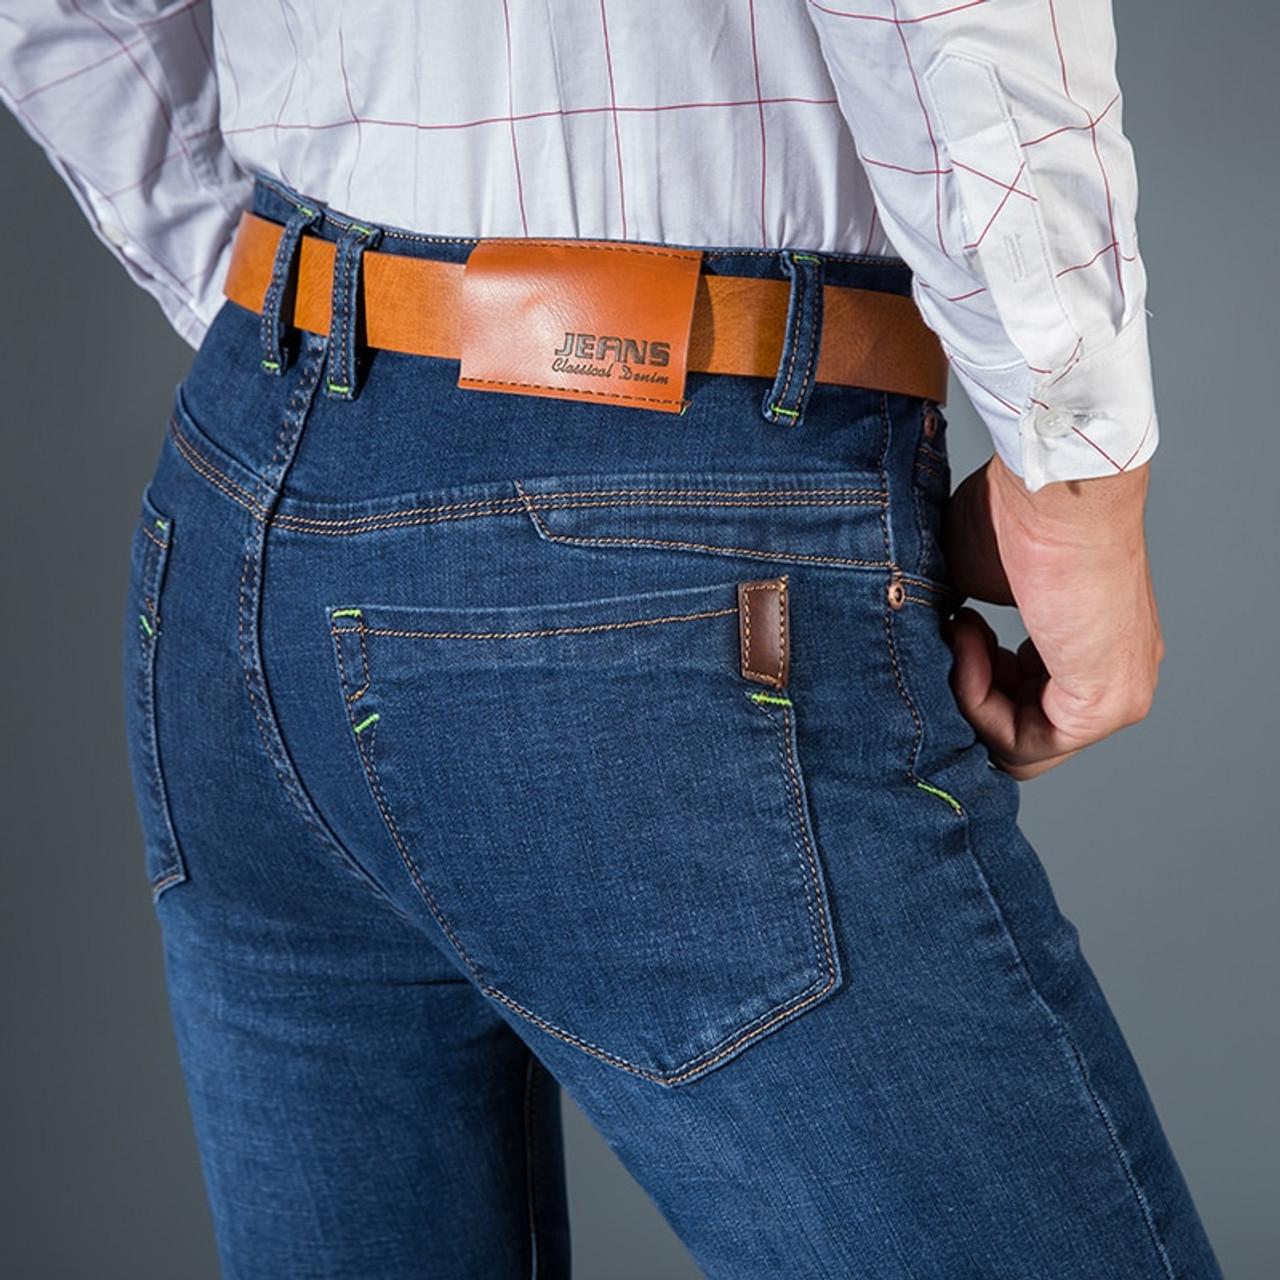 47ca5b4822238 ... Men'S Classic Jeans Brand Large Size Straight Homme Jean Slim  Distressed Design Biker Pants Fit Cheap ...